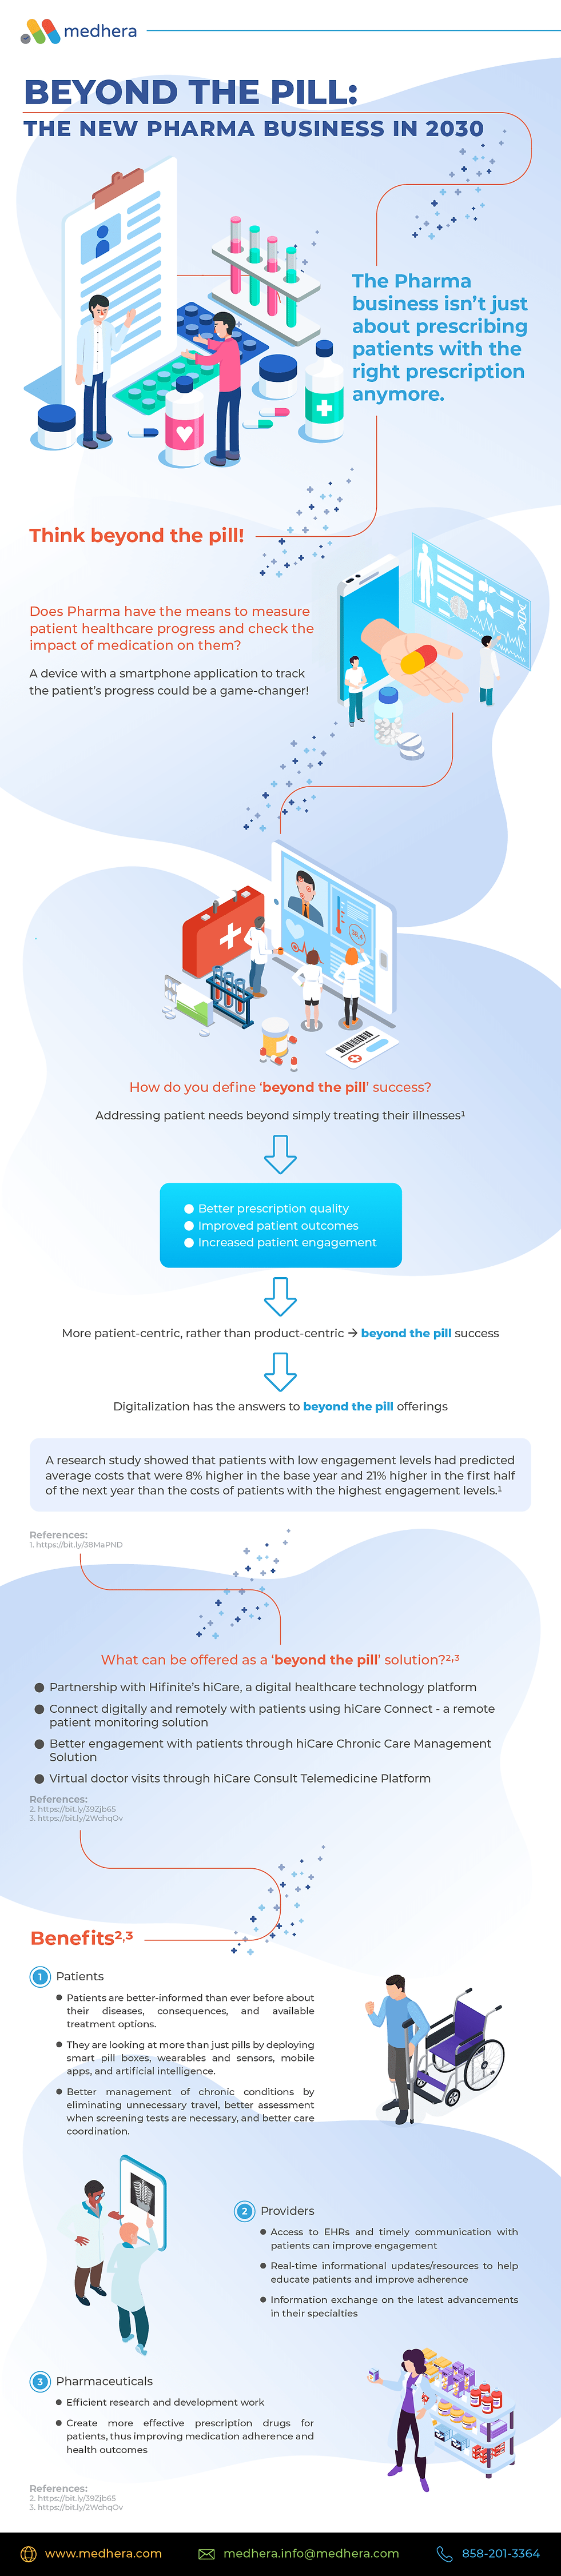 8. Beyond the pill - the new pharma busi